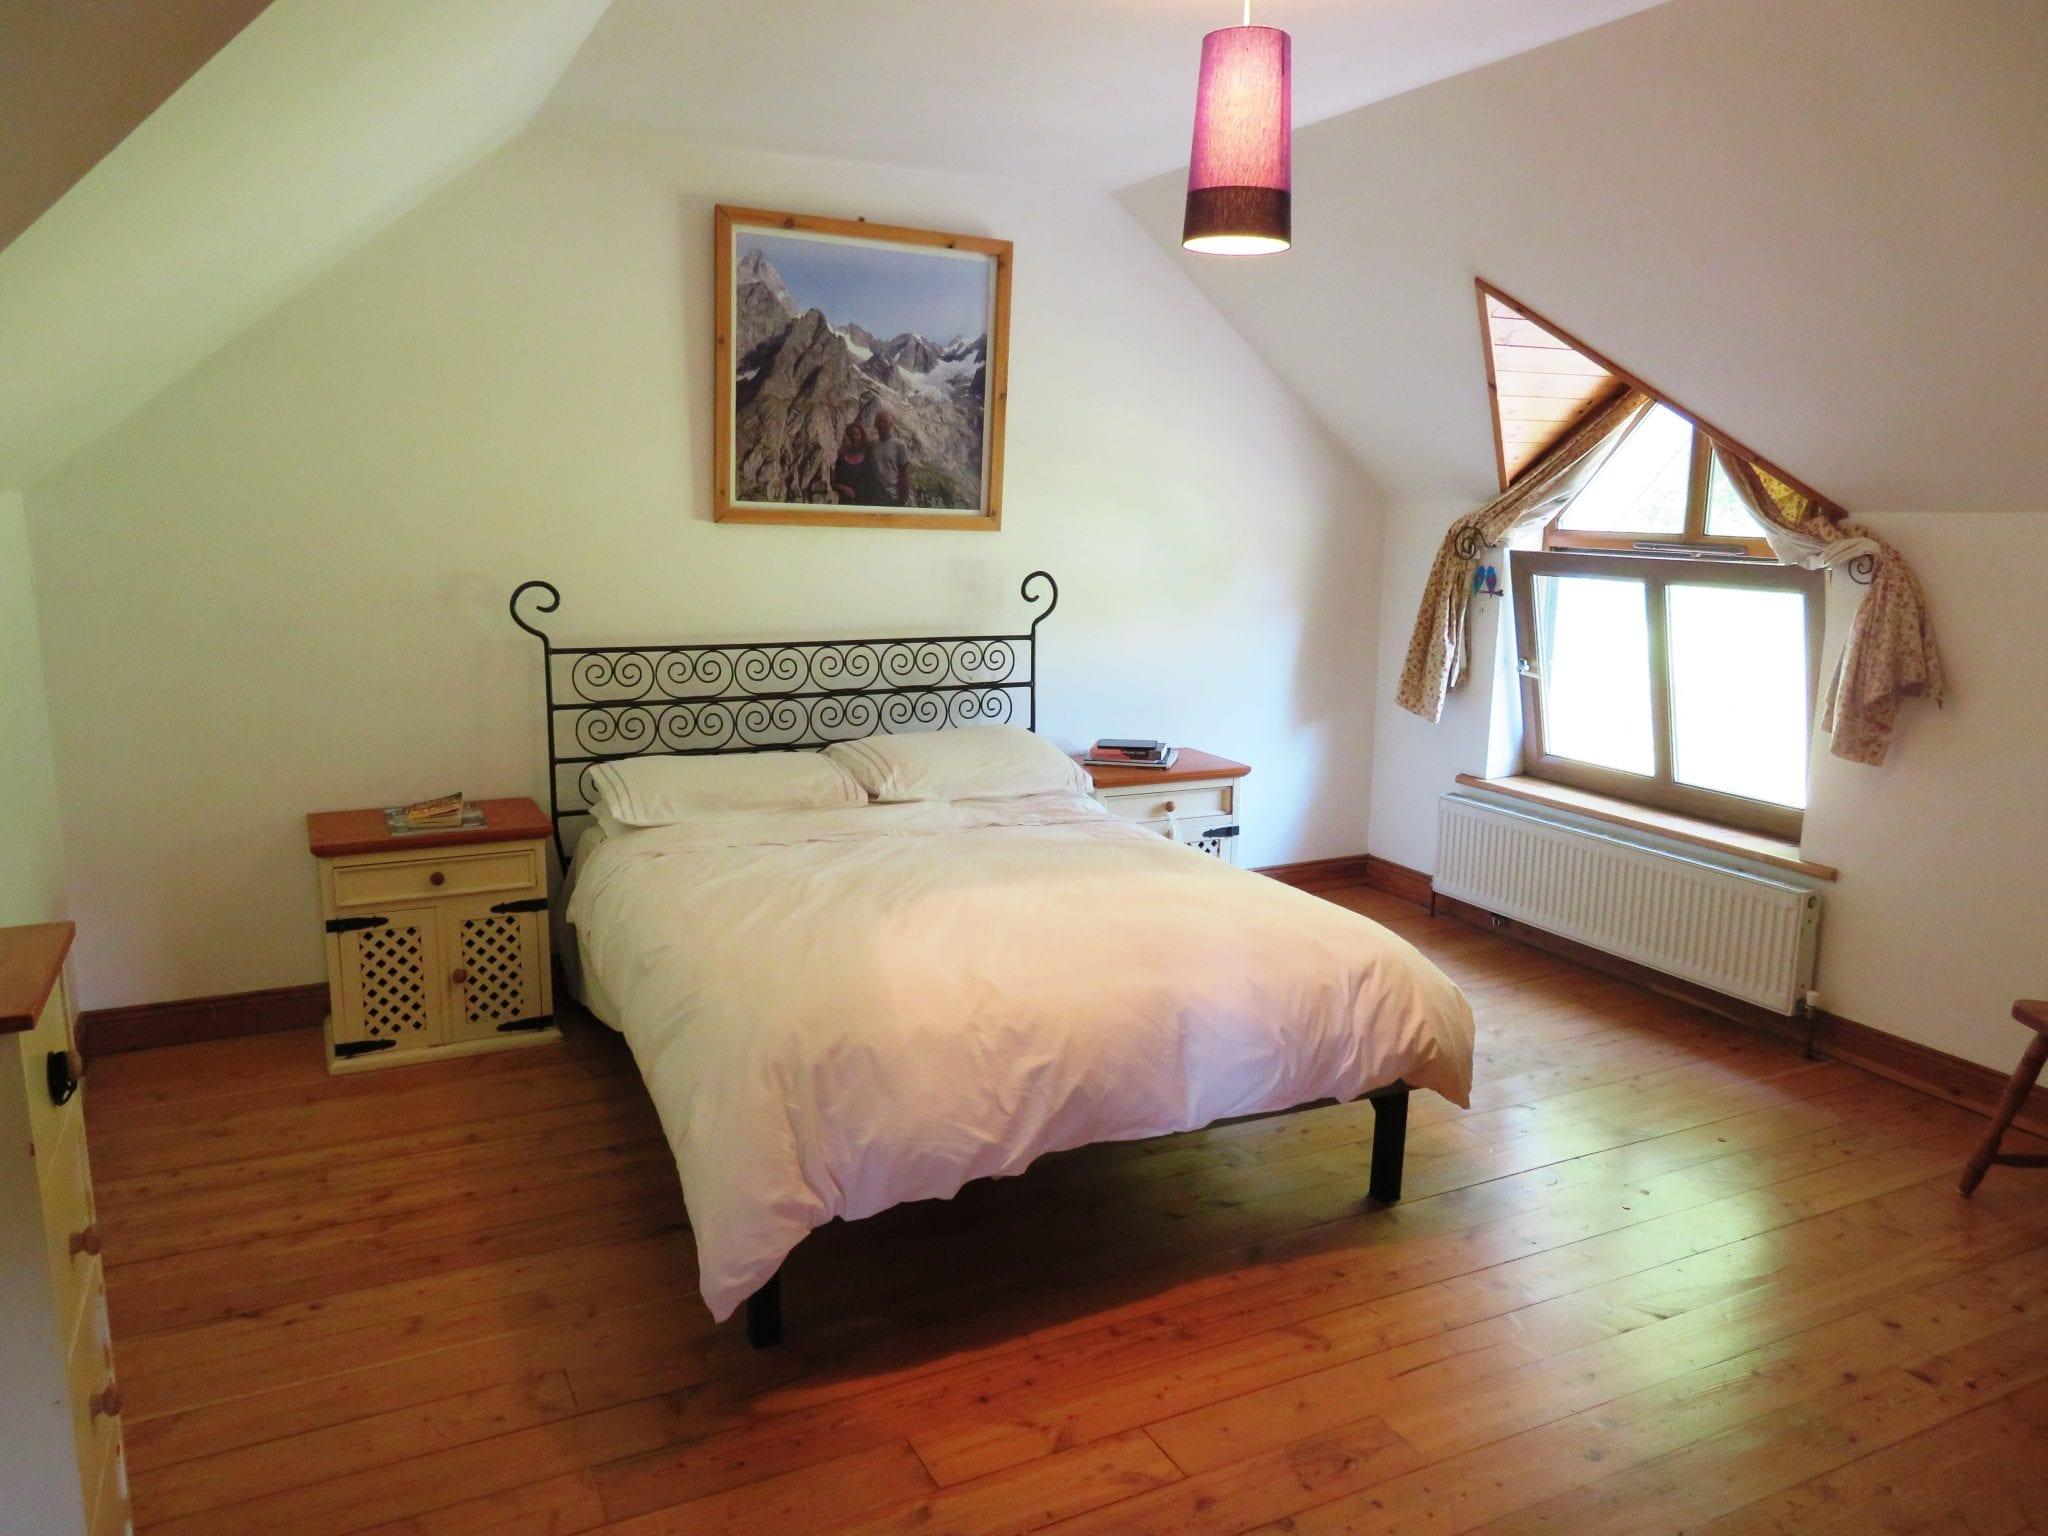 IMG_0020 Bedroom 4